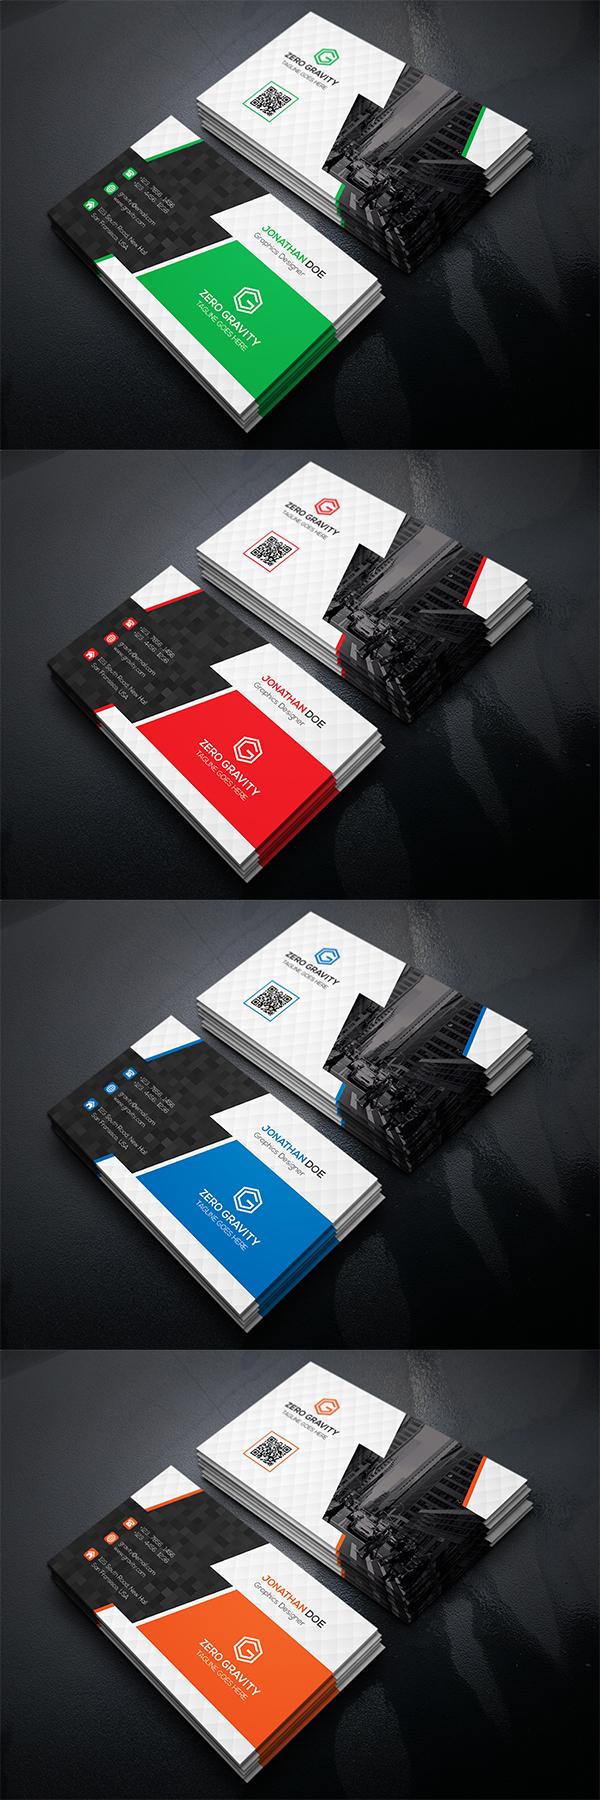 07 Business Card Design